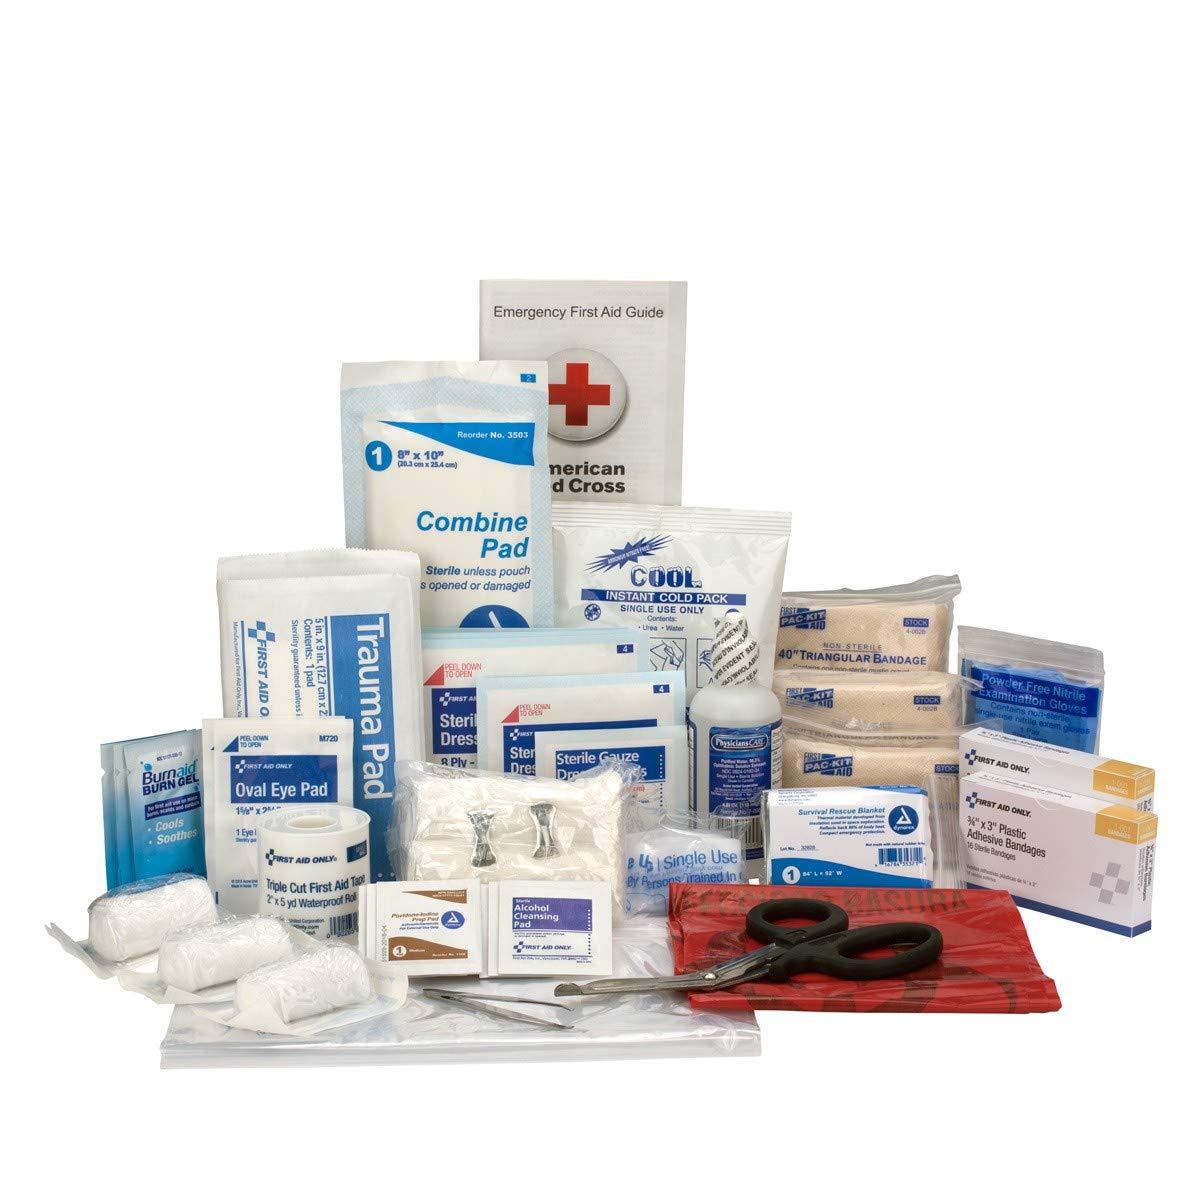 First Responder Kit, Medium Refill Pack   First Responder Bag Trauma Kit Medical Bag Emergency Kit Brite Safety BS-FAK-510-FR/REFILL-1-FM